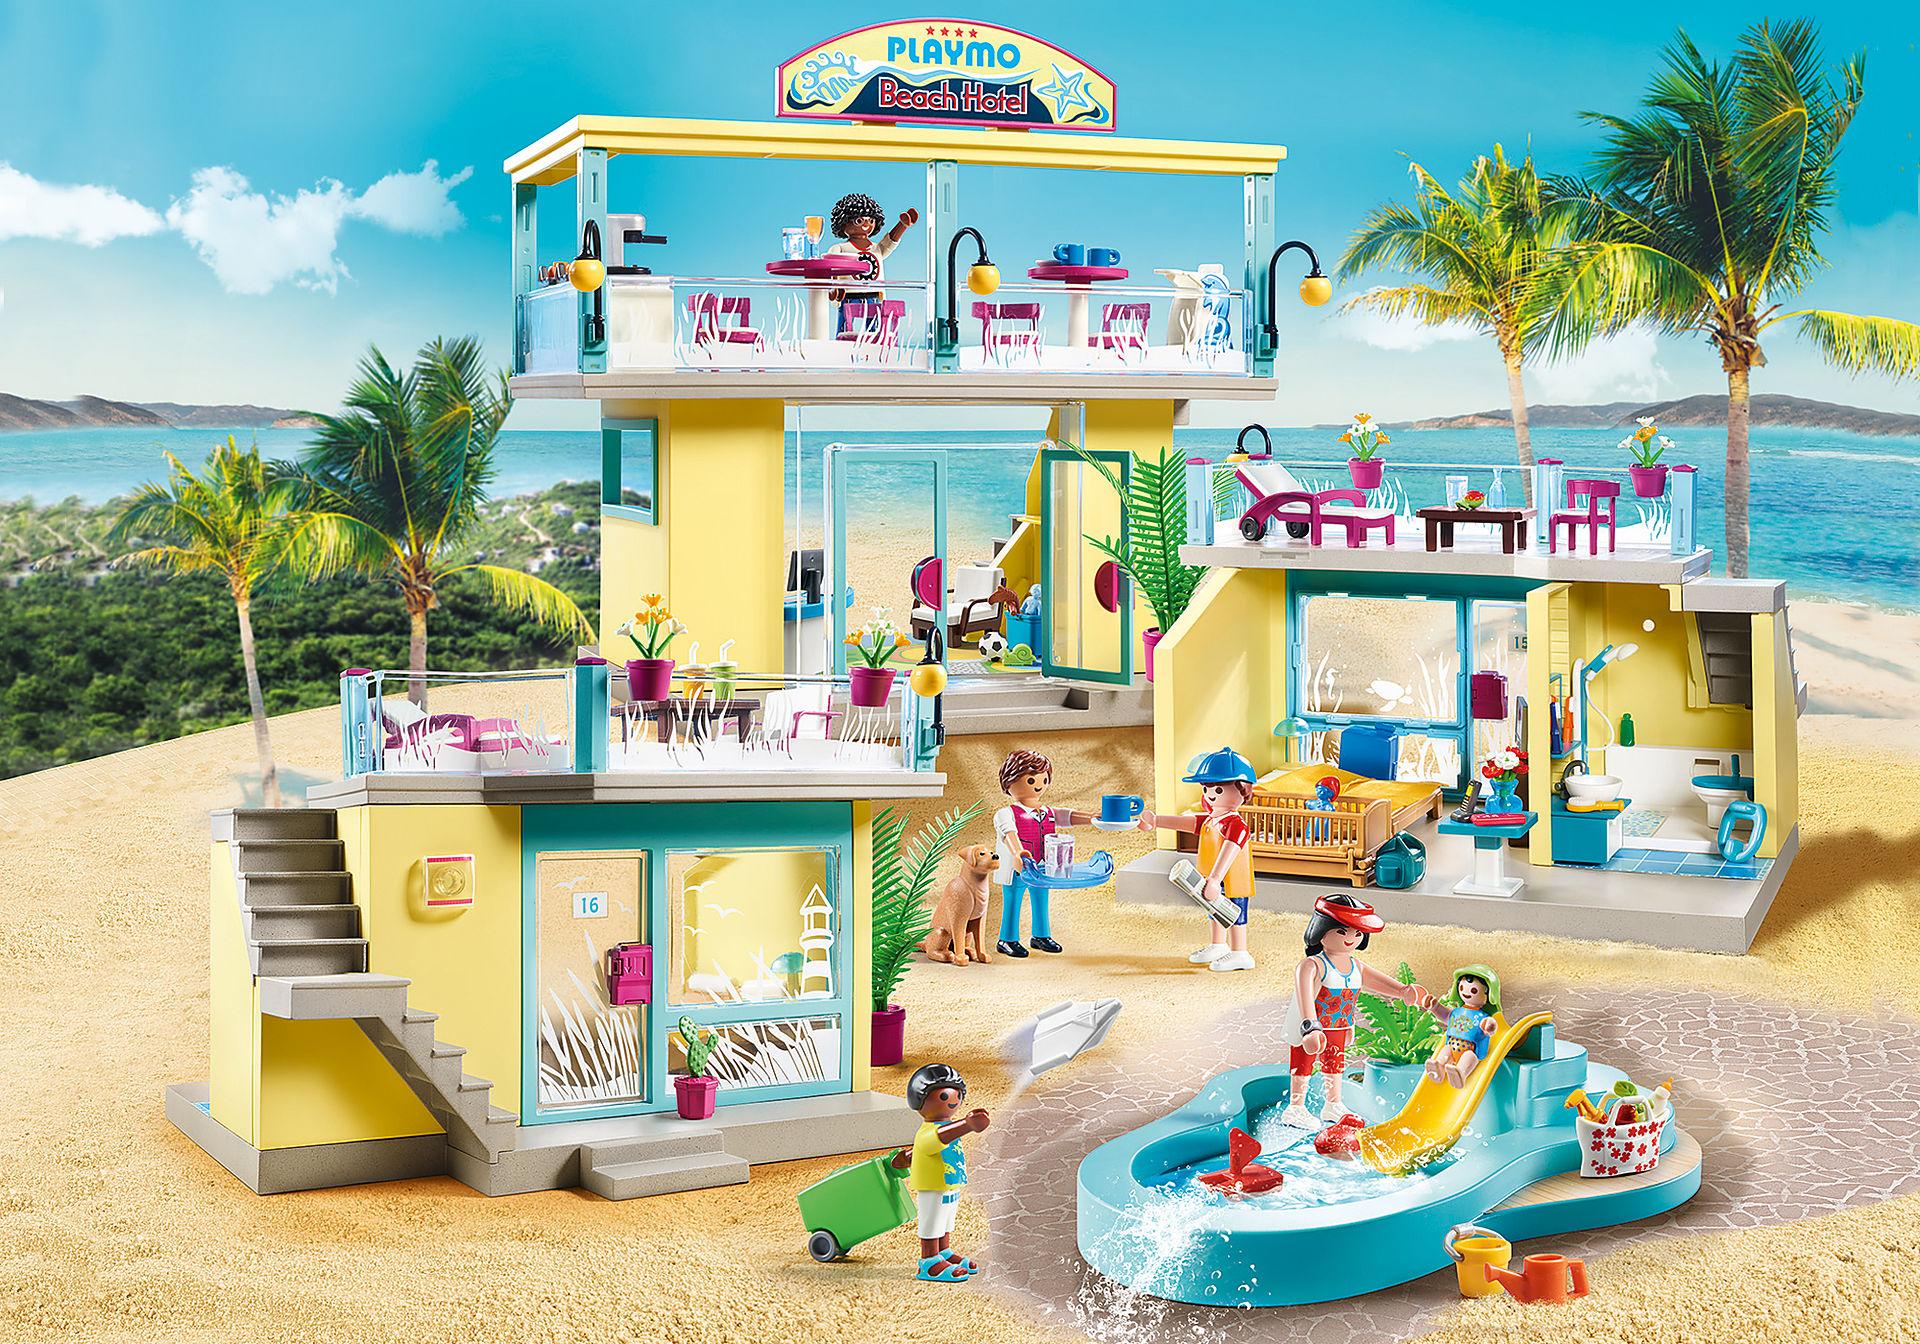 70434 PLAYMO Beach Hotel zoom image1